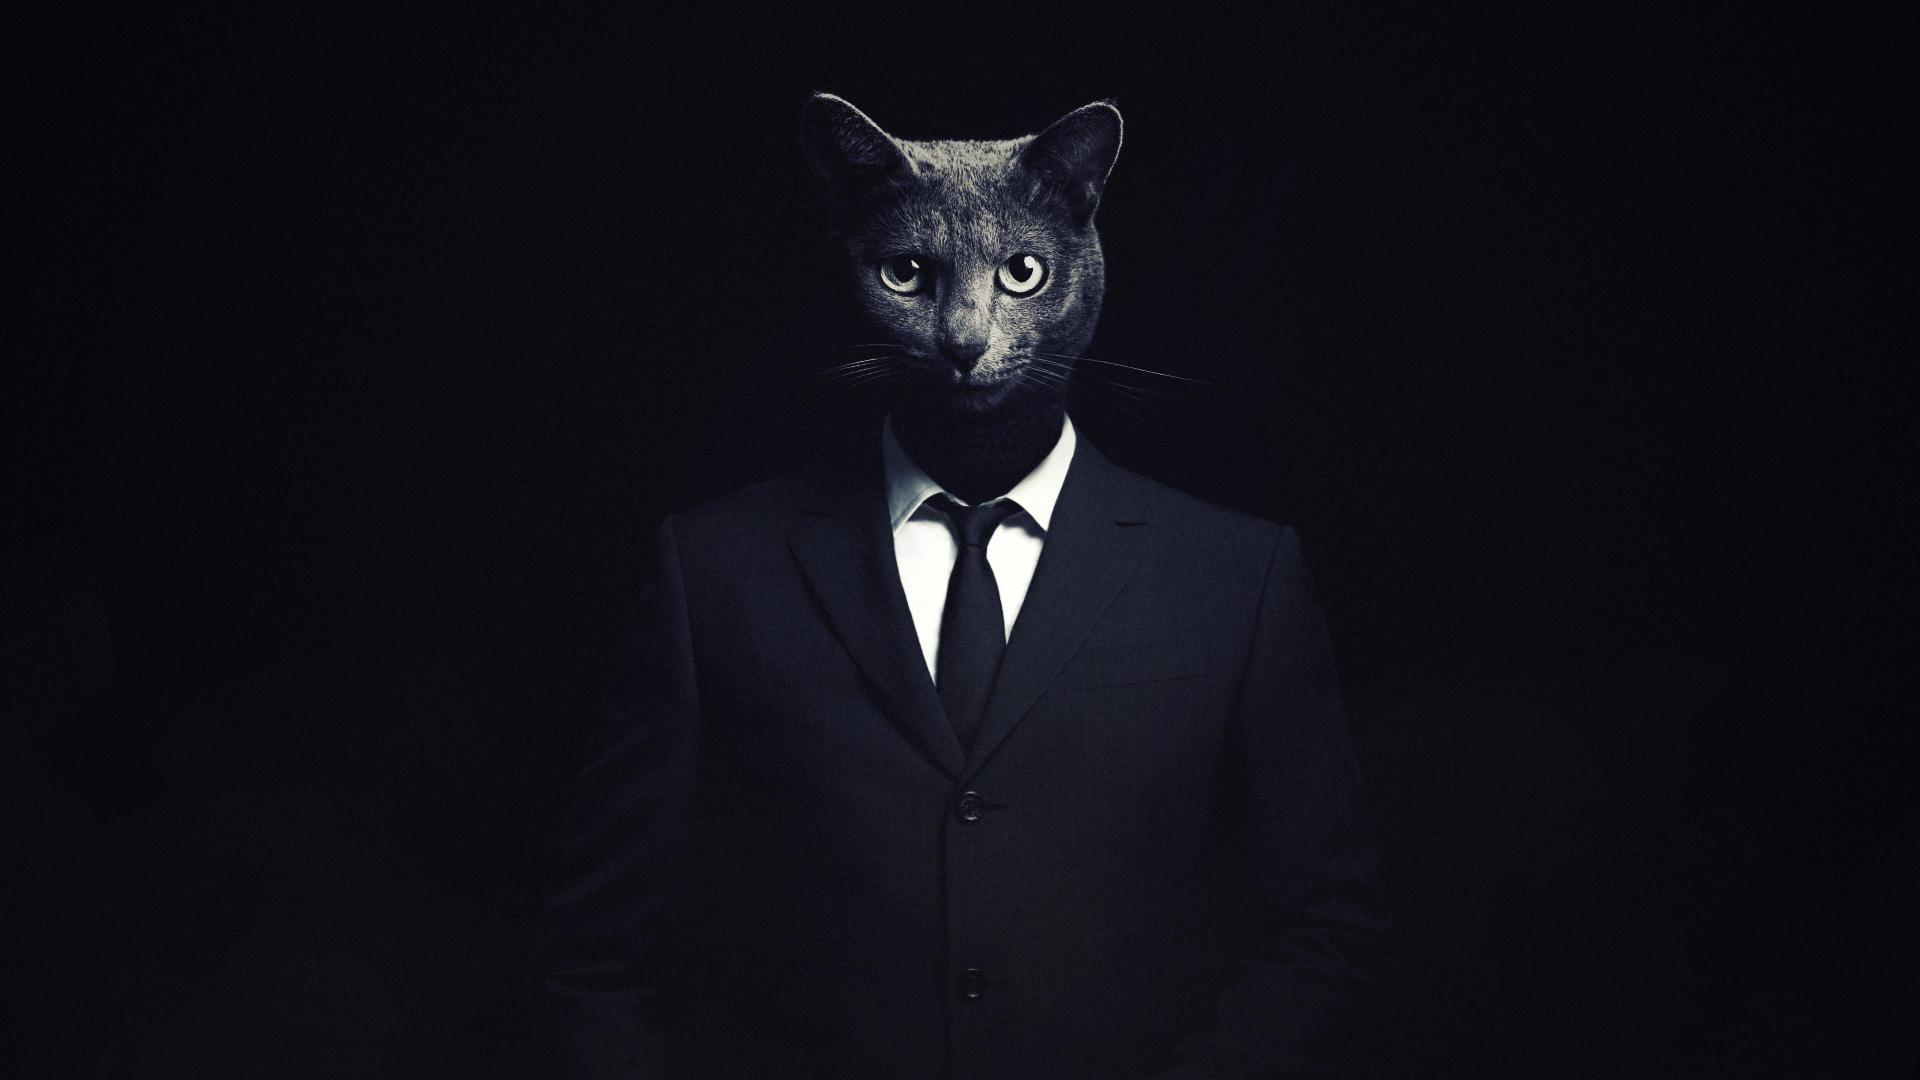 Cat The Killer By Hshamsi On Deviantart